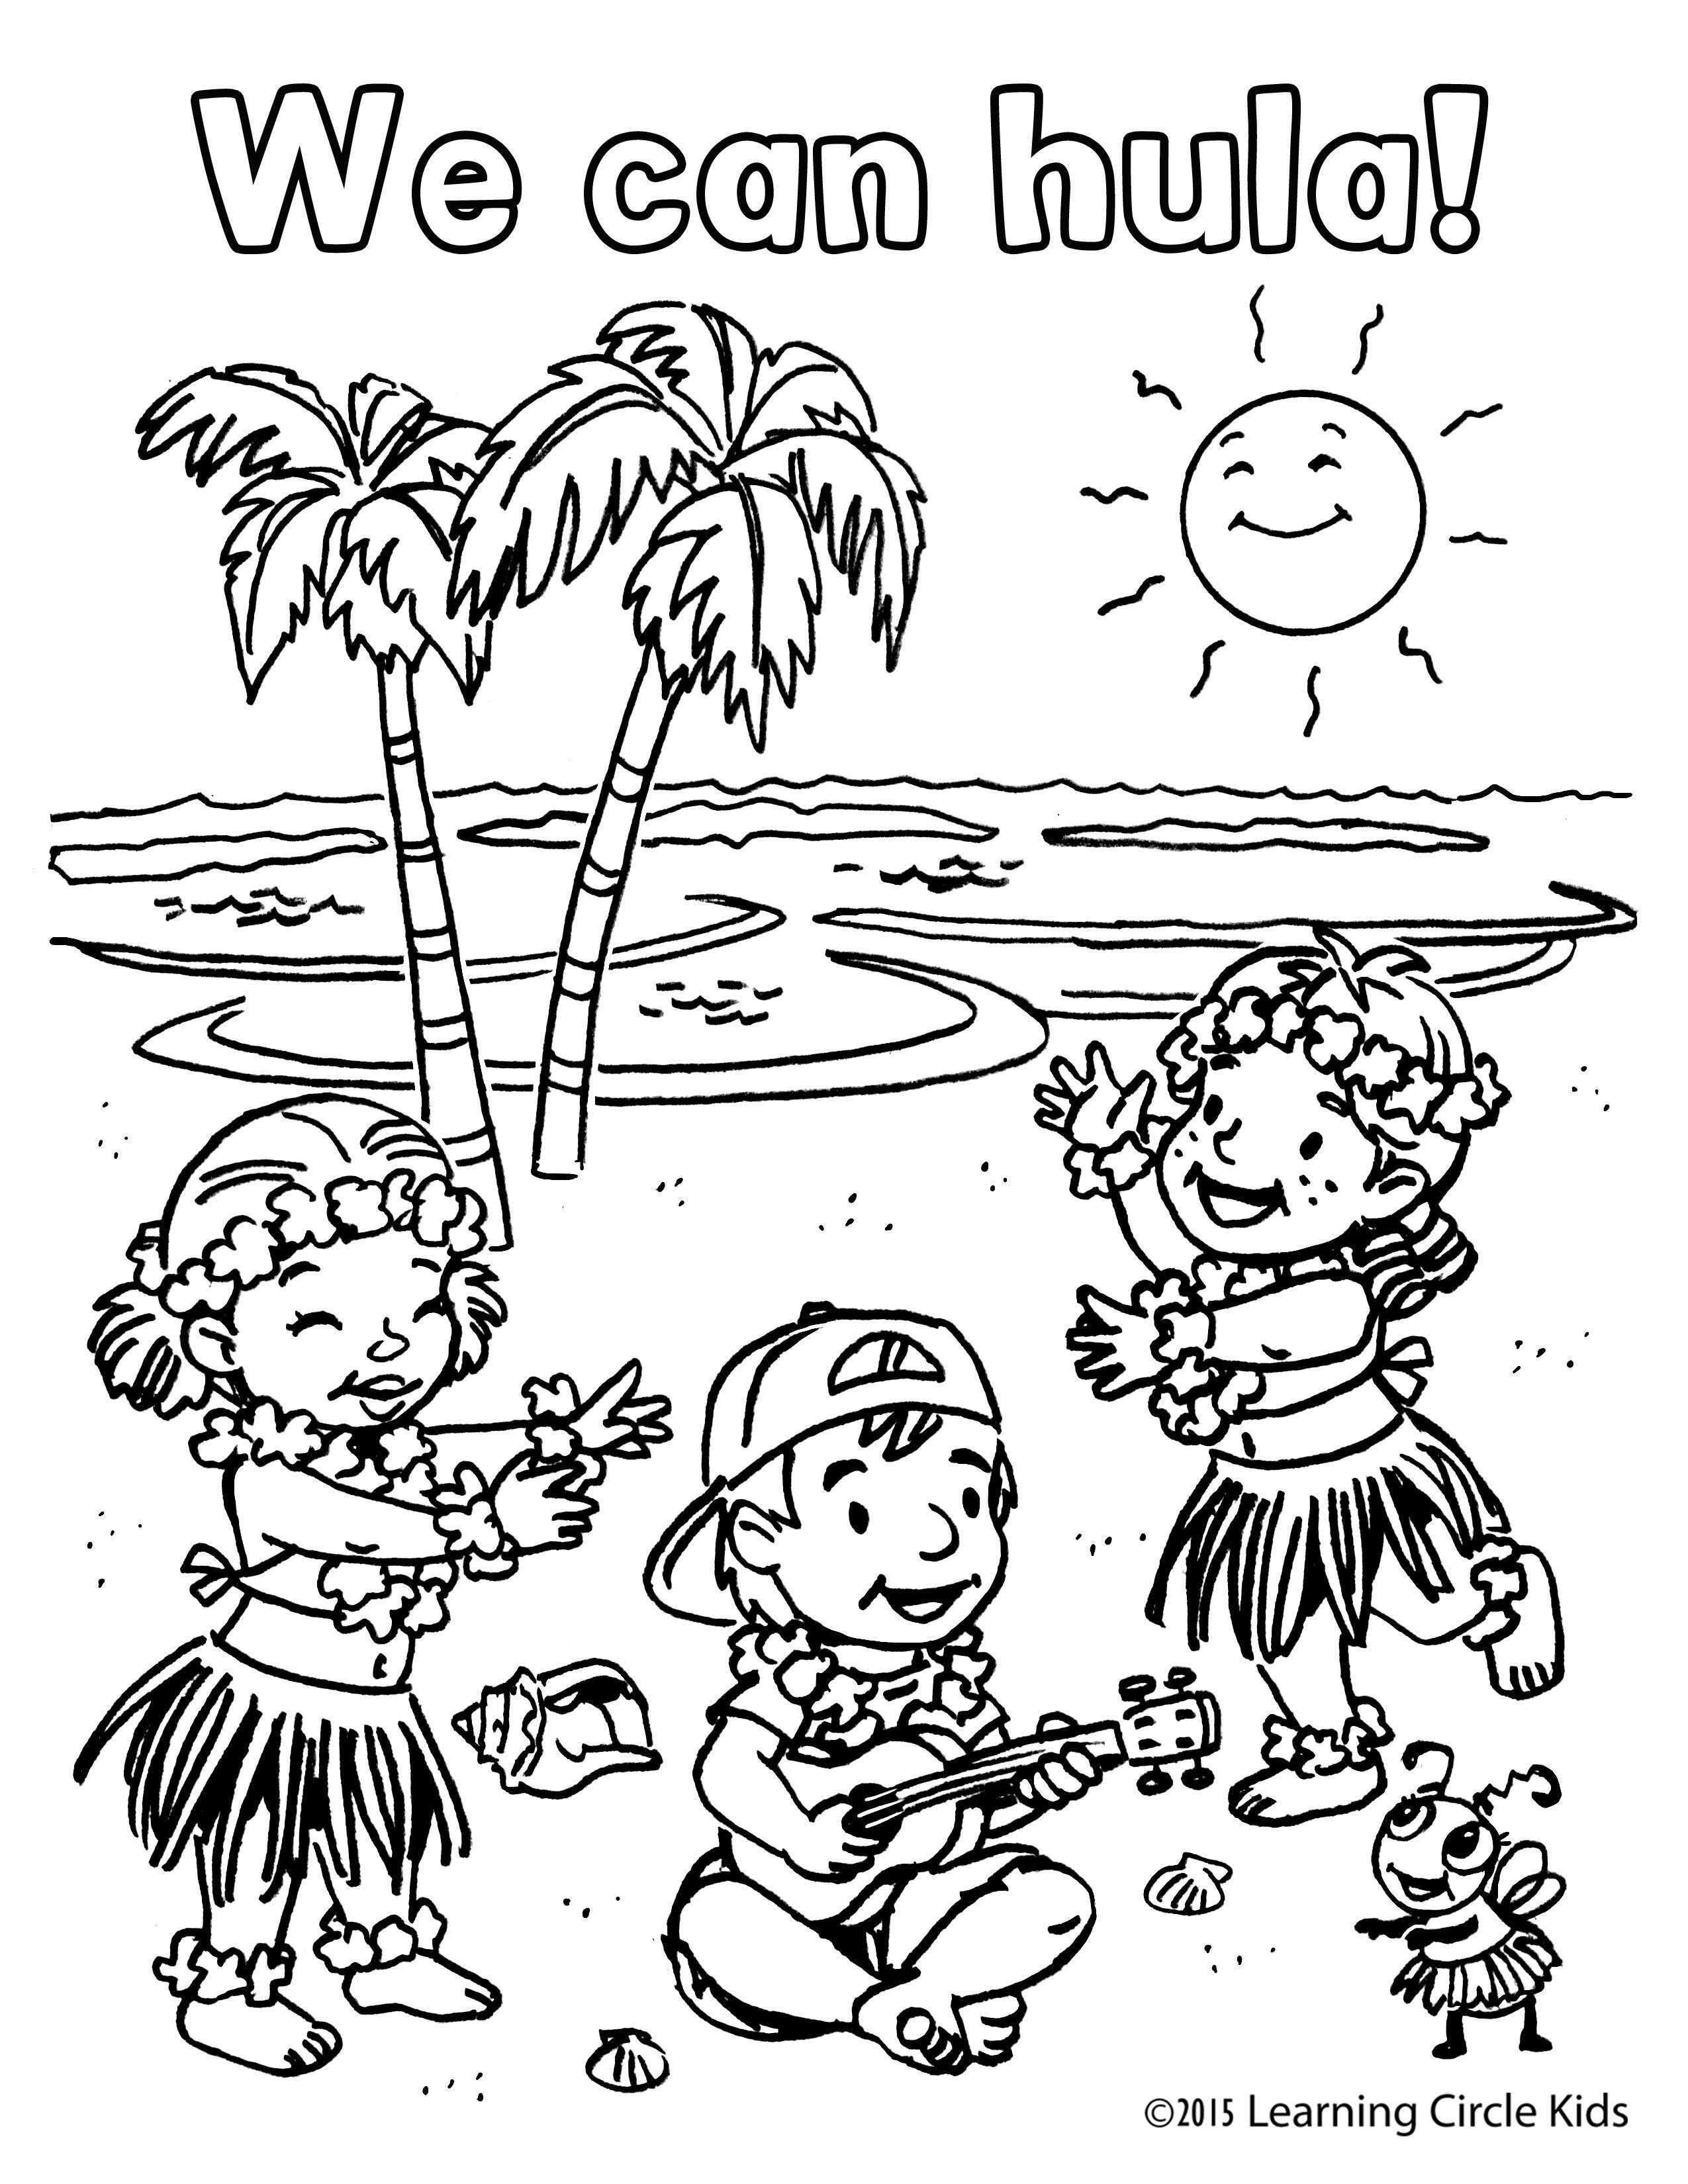 Reader Bee characters Carlos, Joy, and Angela enjoy summer fun in ...